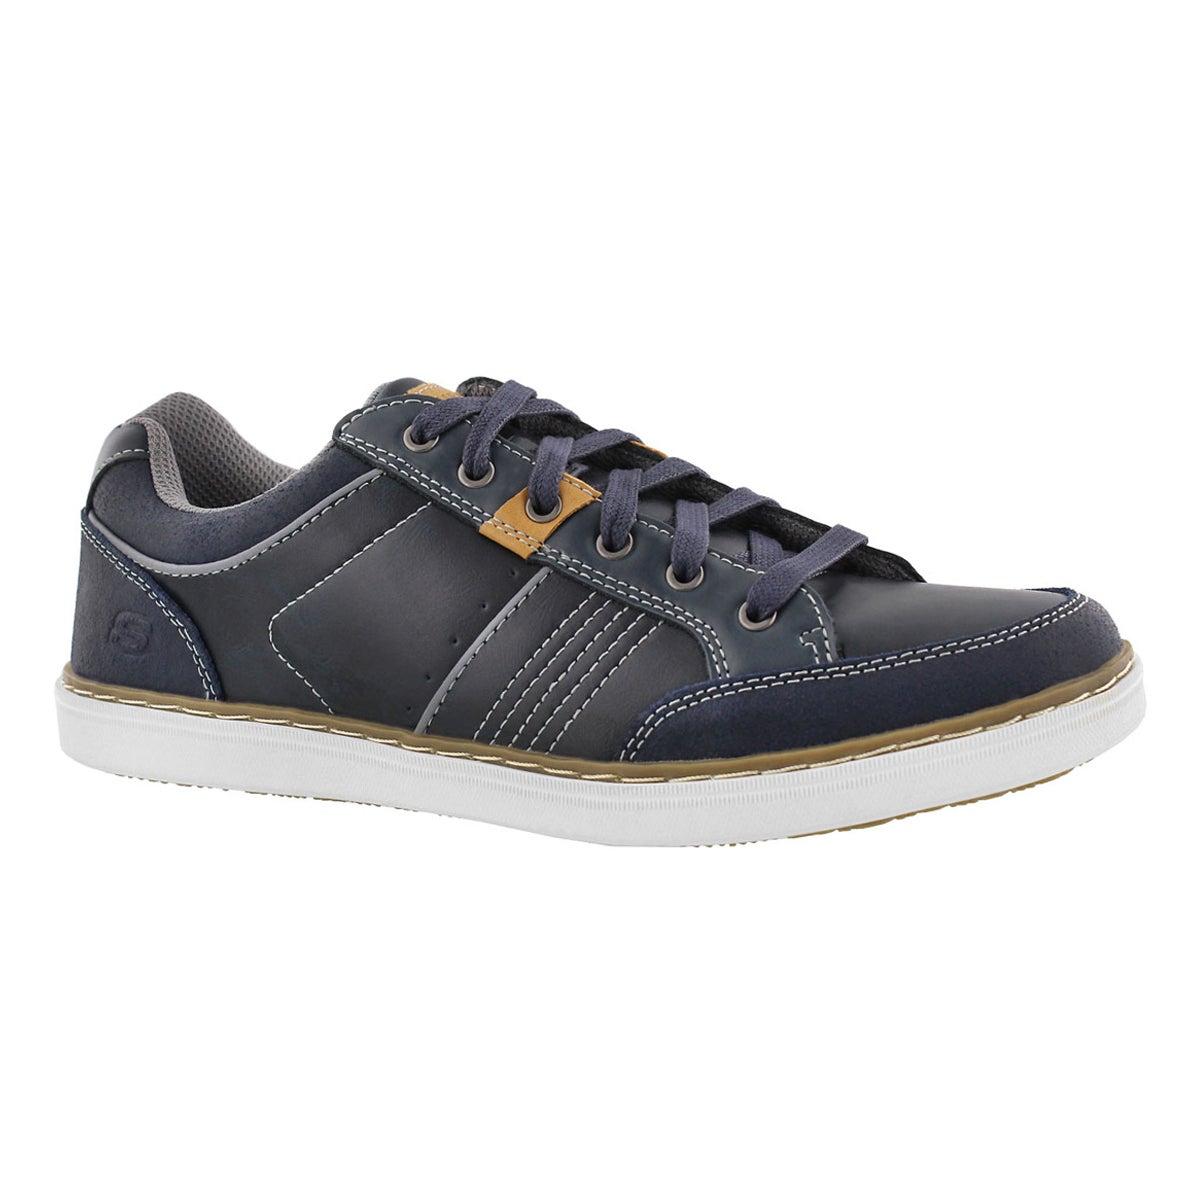 Men's LANSON ROMETO navy lace up sneakers